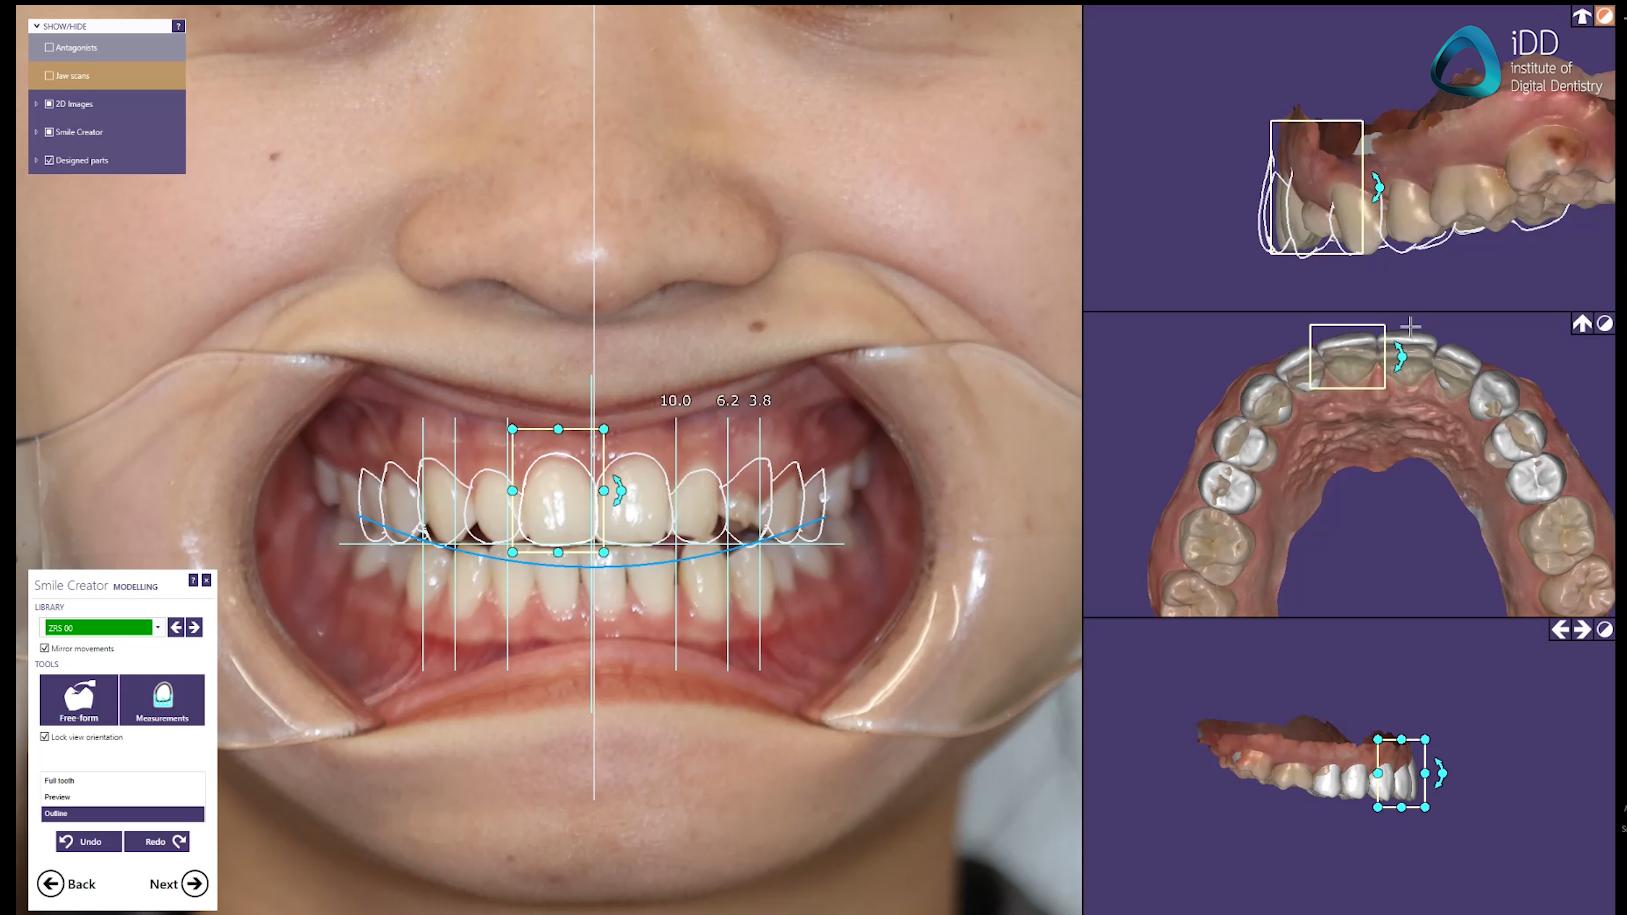 exocad smile creator software digital smile design institute of digital dentistry